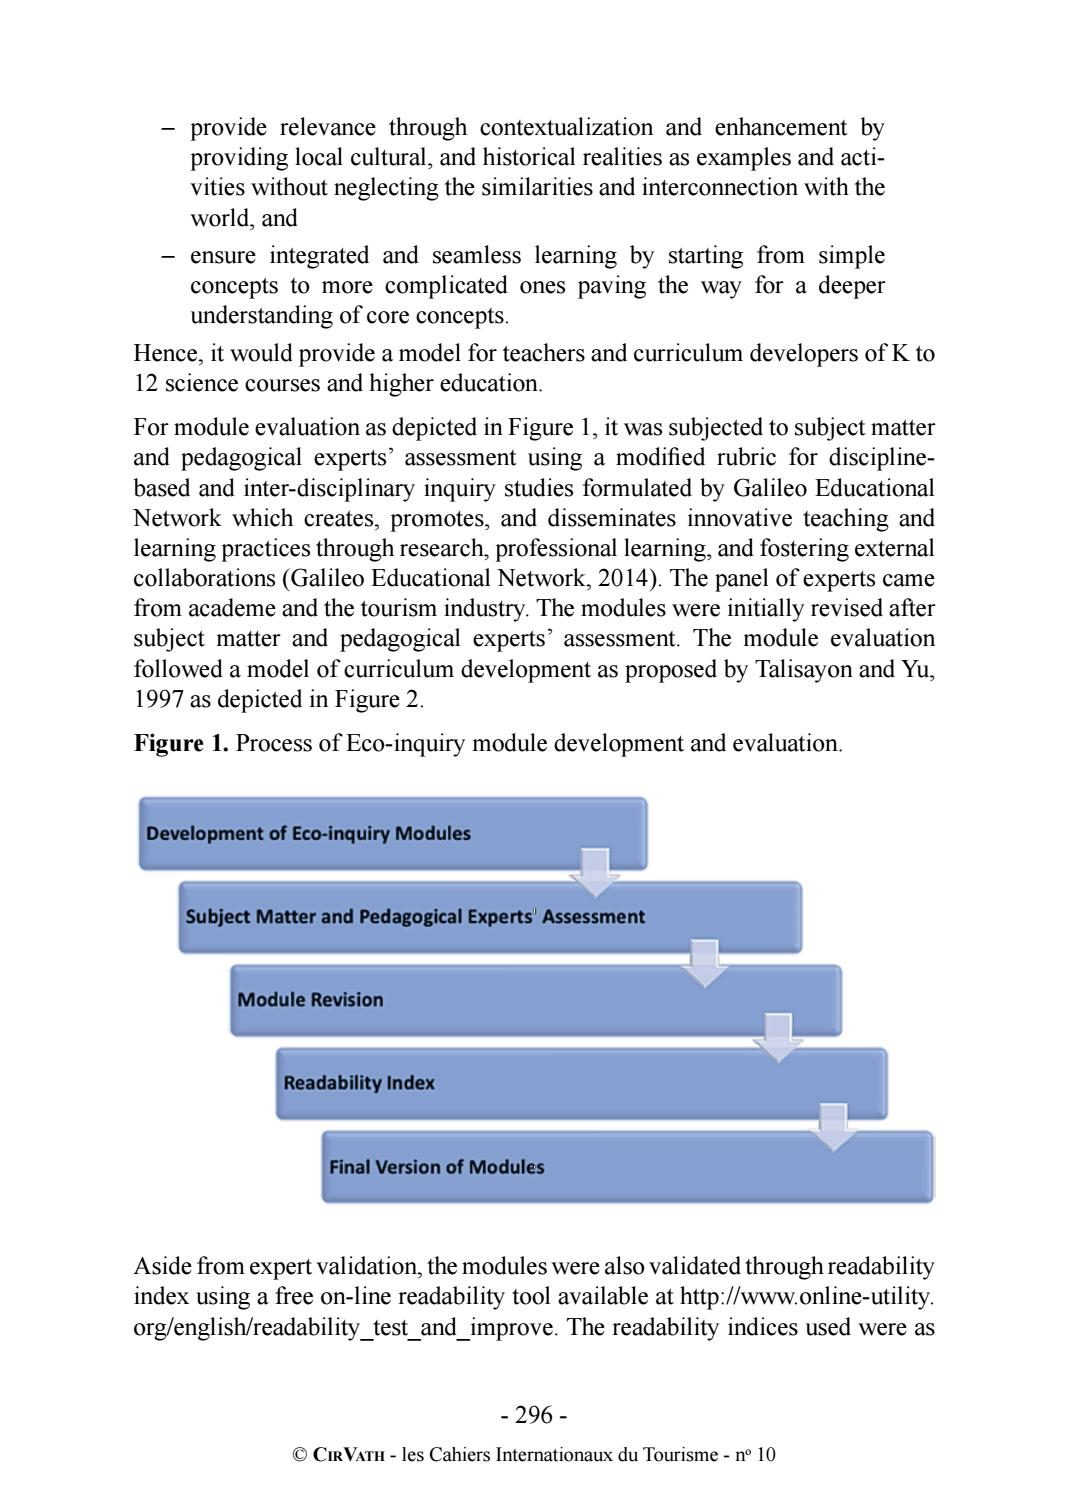 CirVath International Journal of Tourism 10 by Vatel - issuu